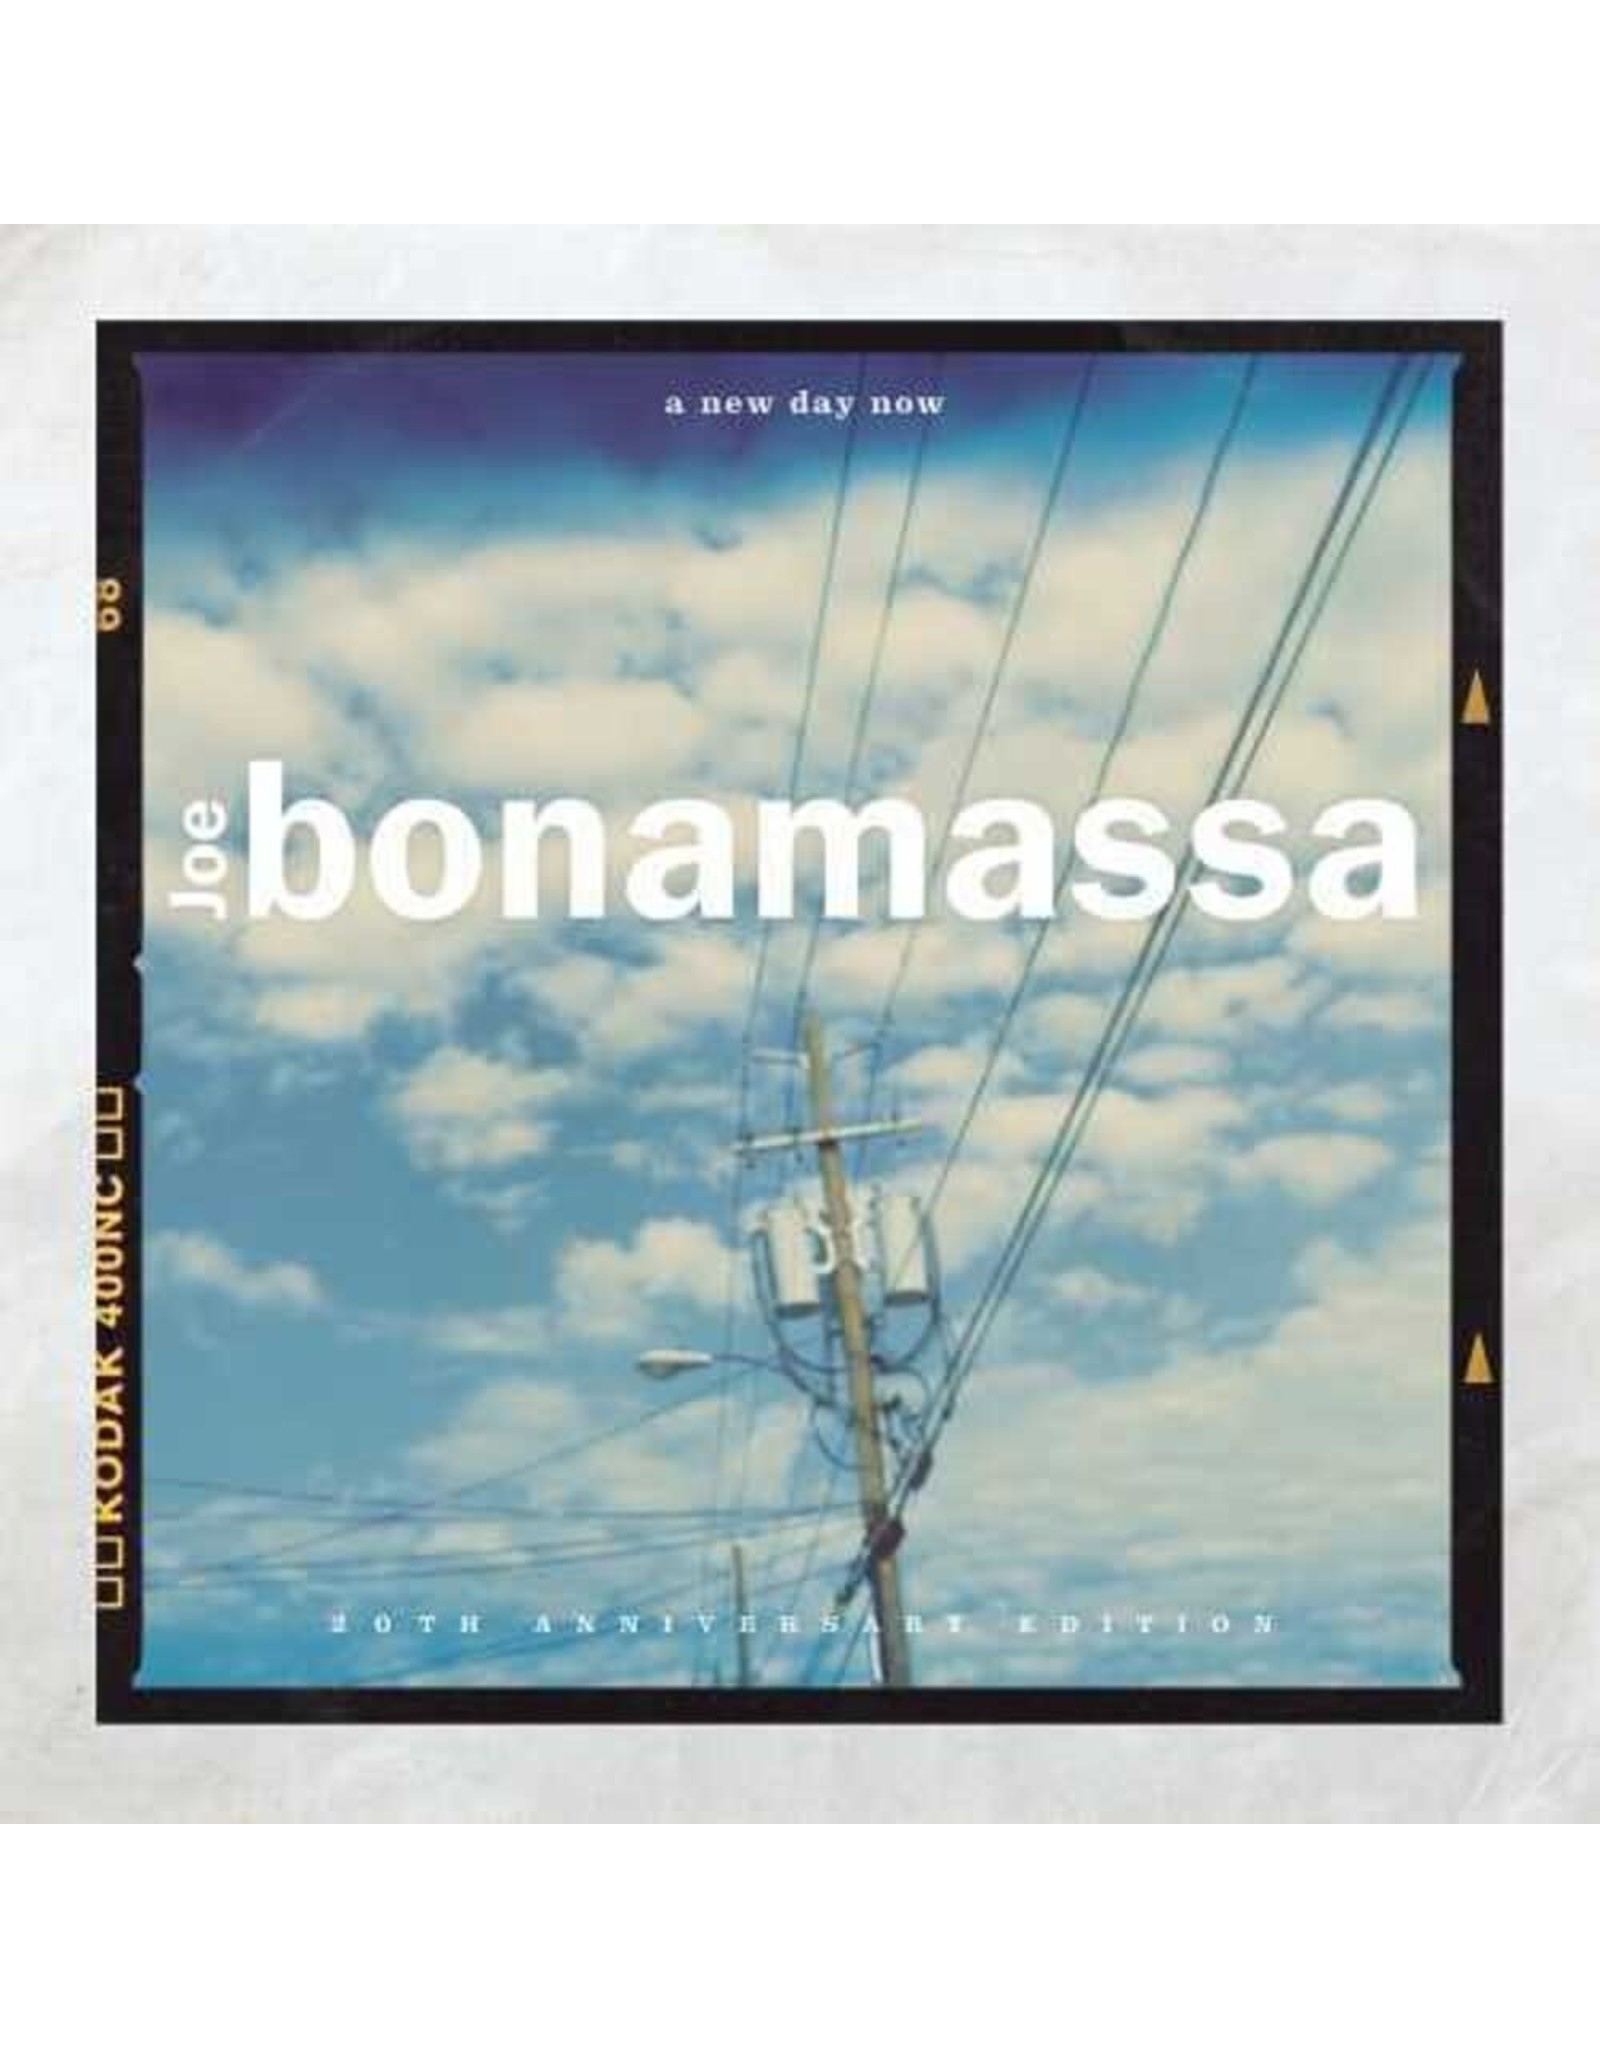 Bonamassa, Joe - A New Day Now (20th Anniversary Edition) CD